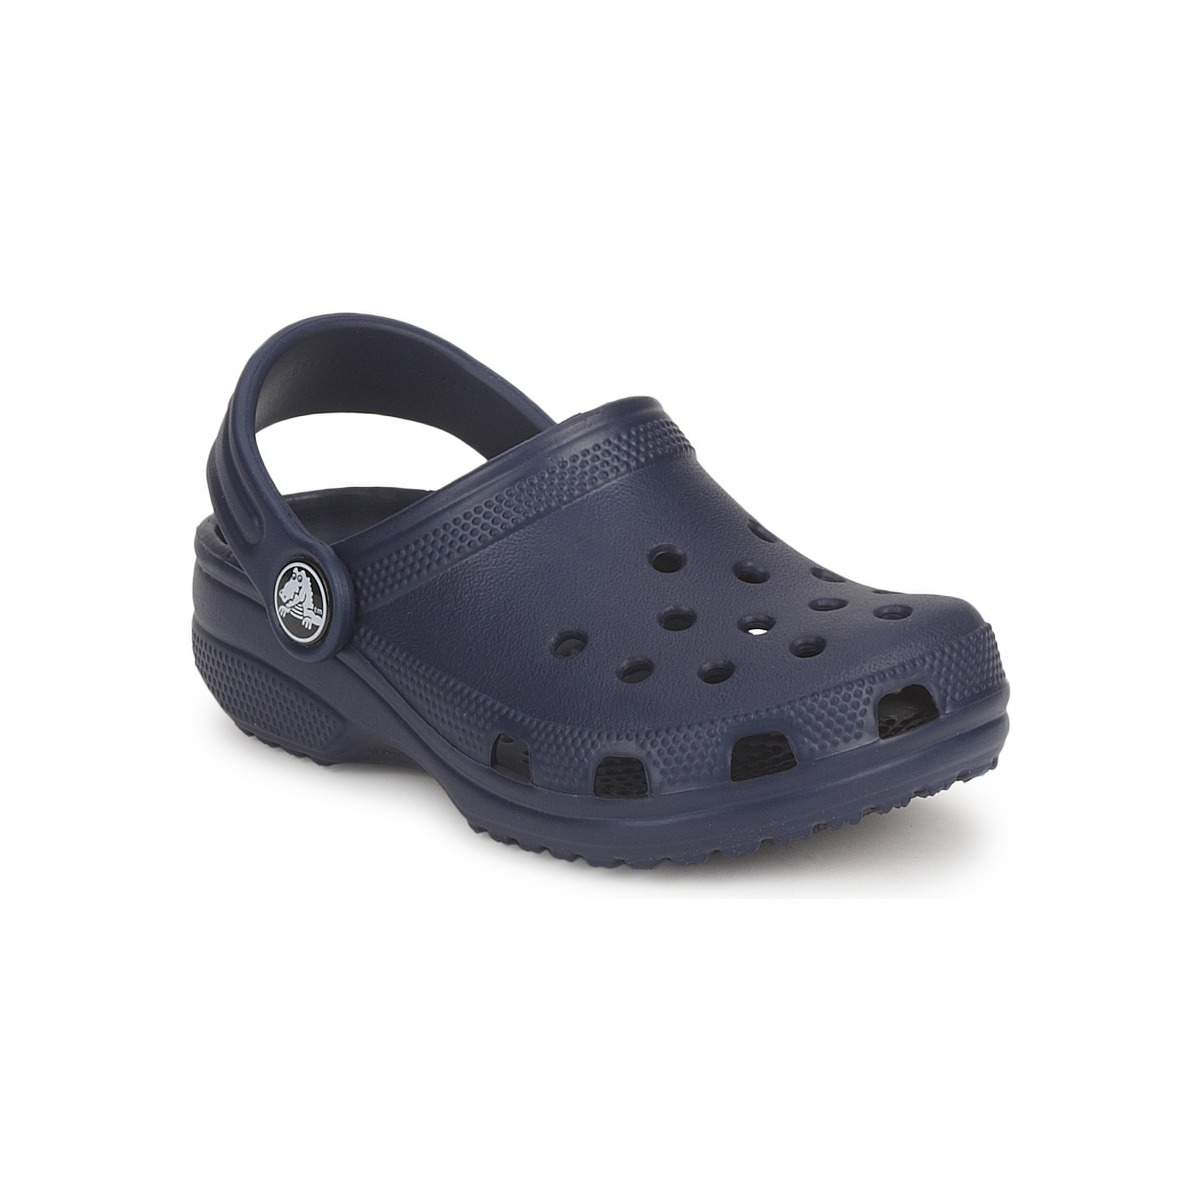 Crocs CLASSIC KIDS Marine